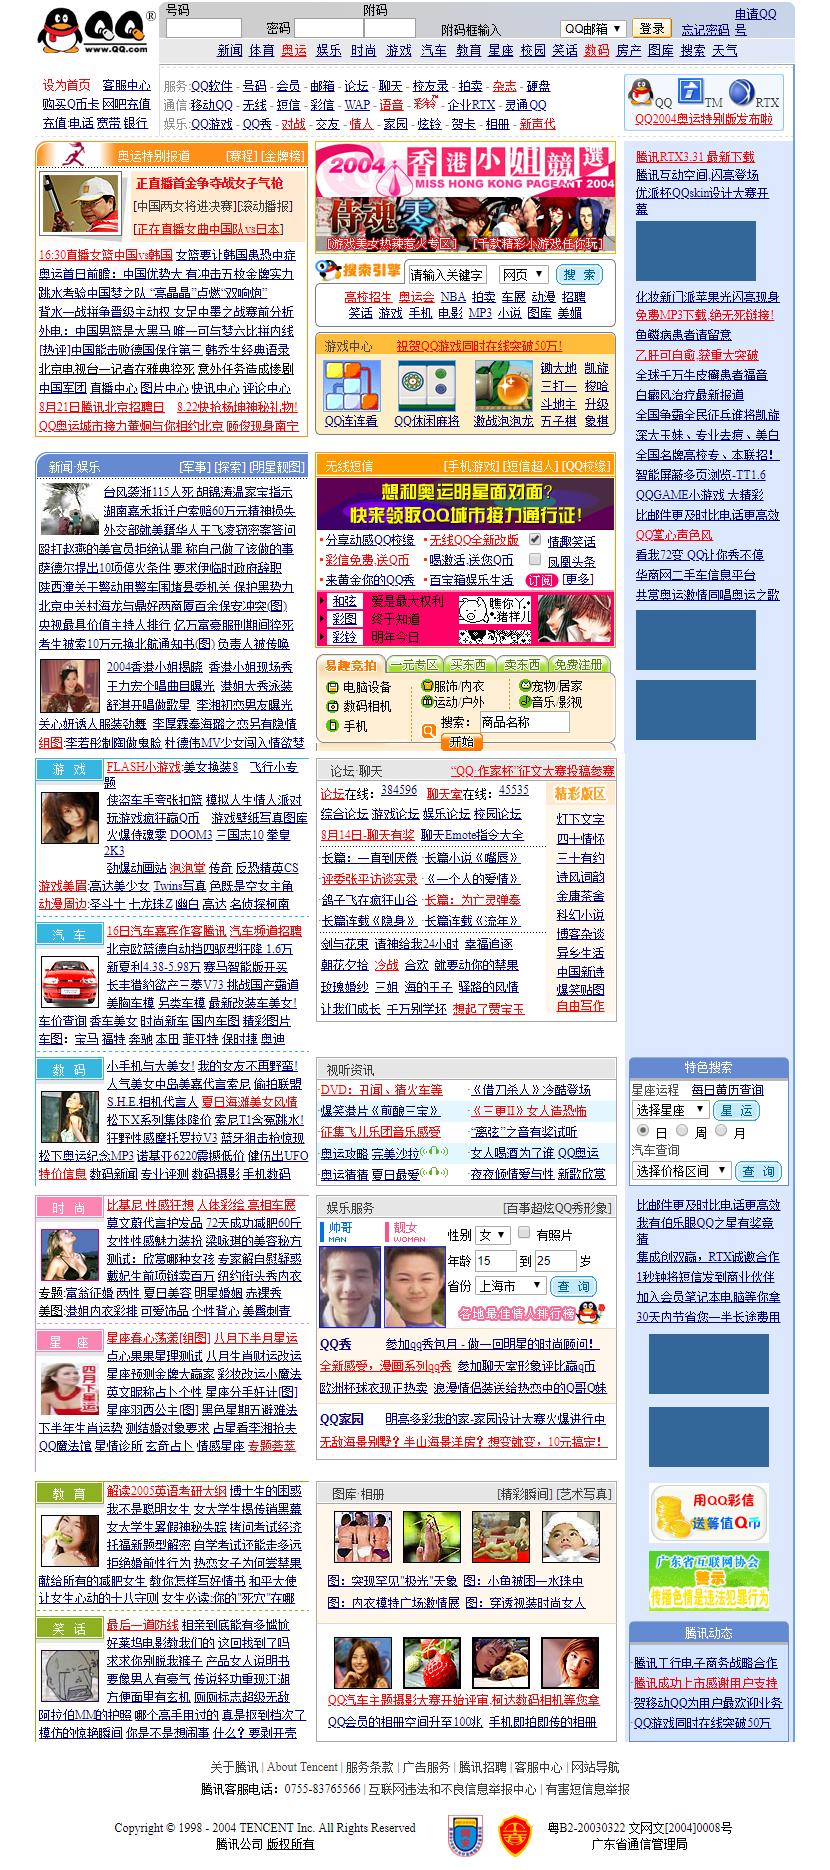 Tencent Qq Website In 2004 Tencent Qq Web Design Design Museum